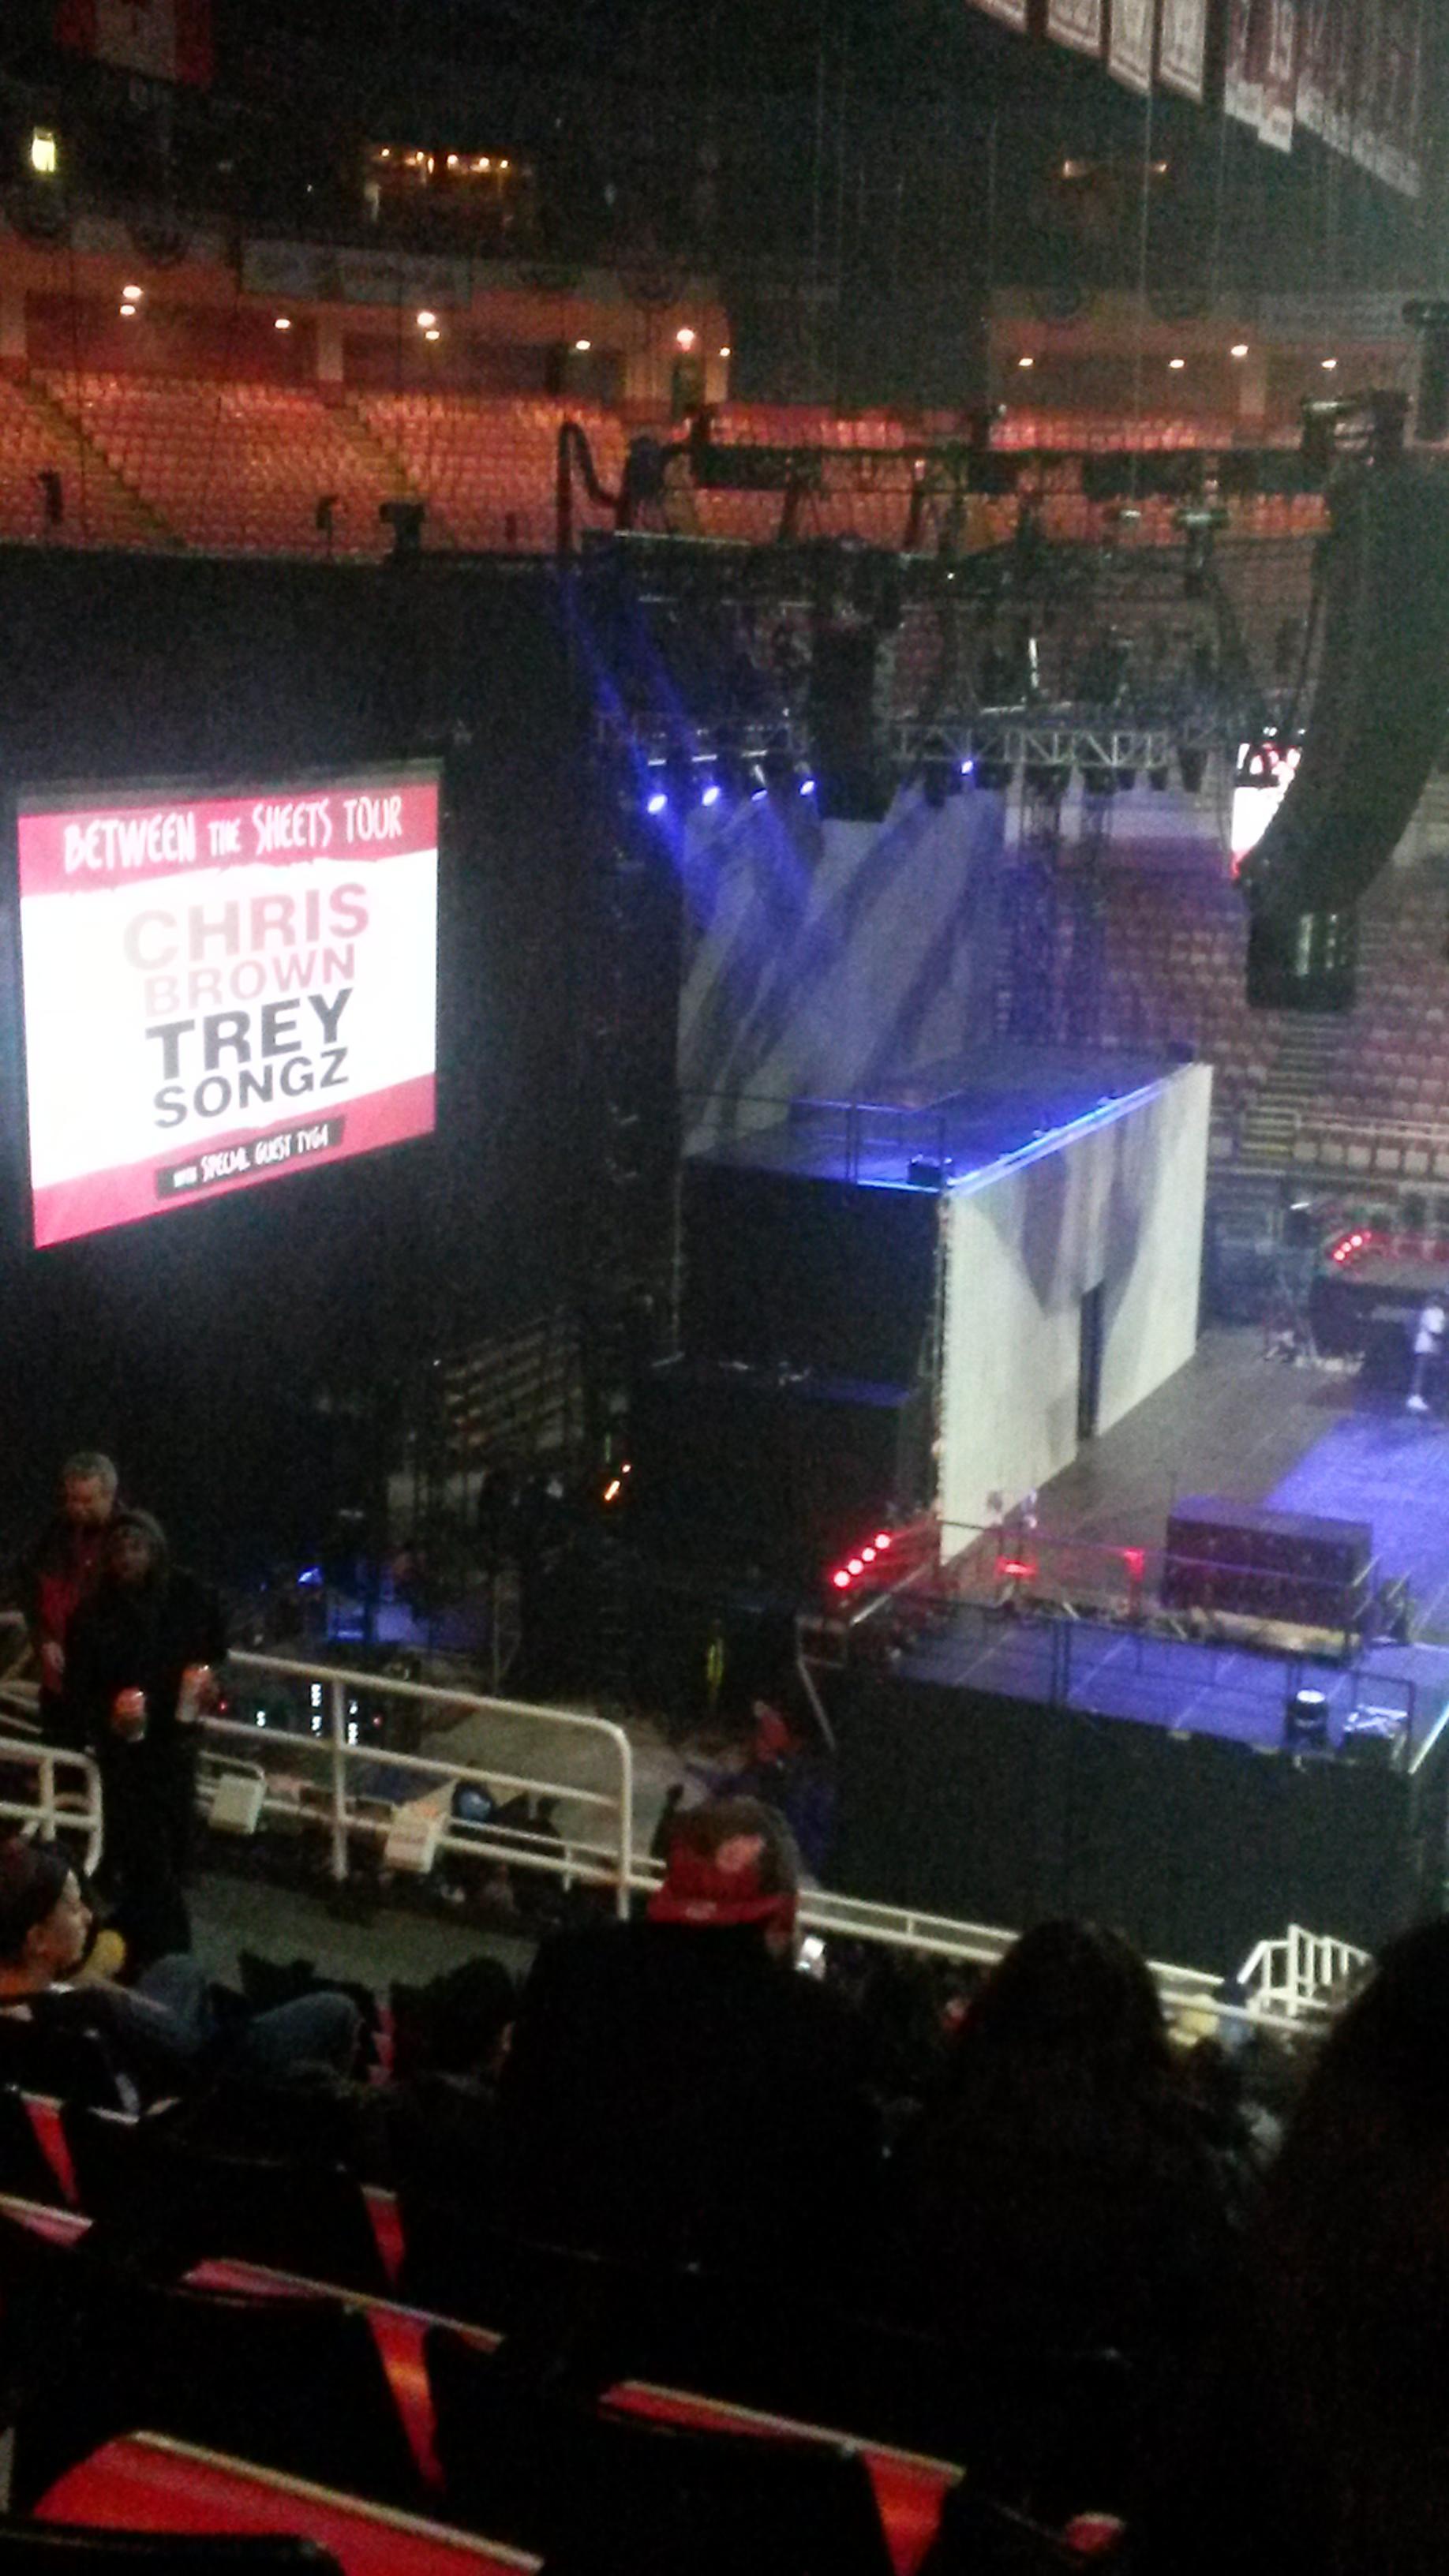 joe louis arena Section 209 Row 11 Seat 8